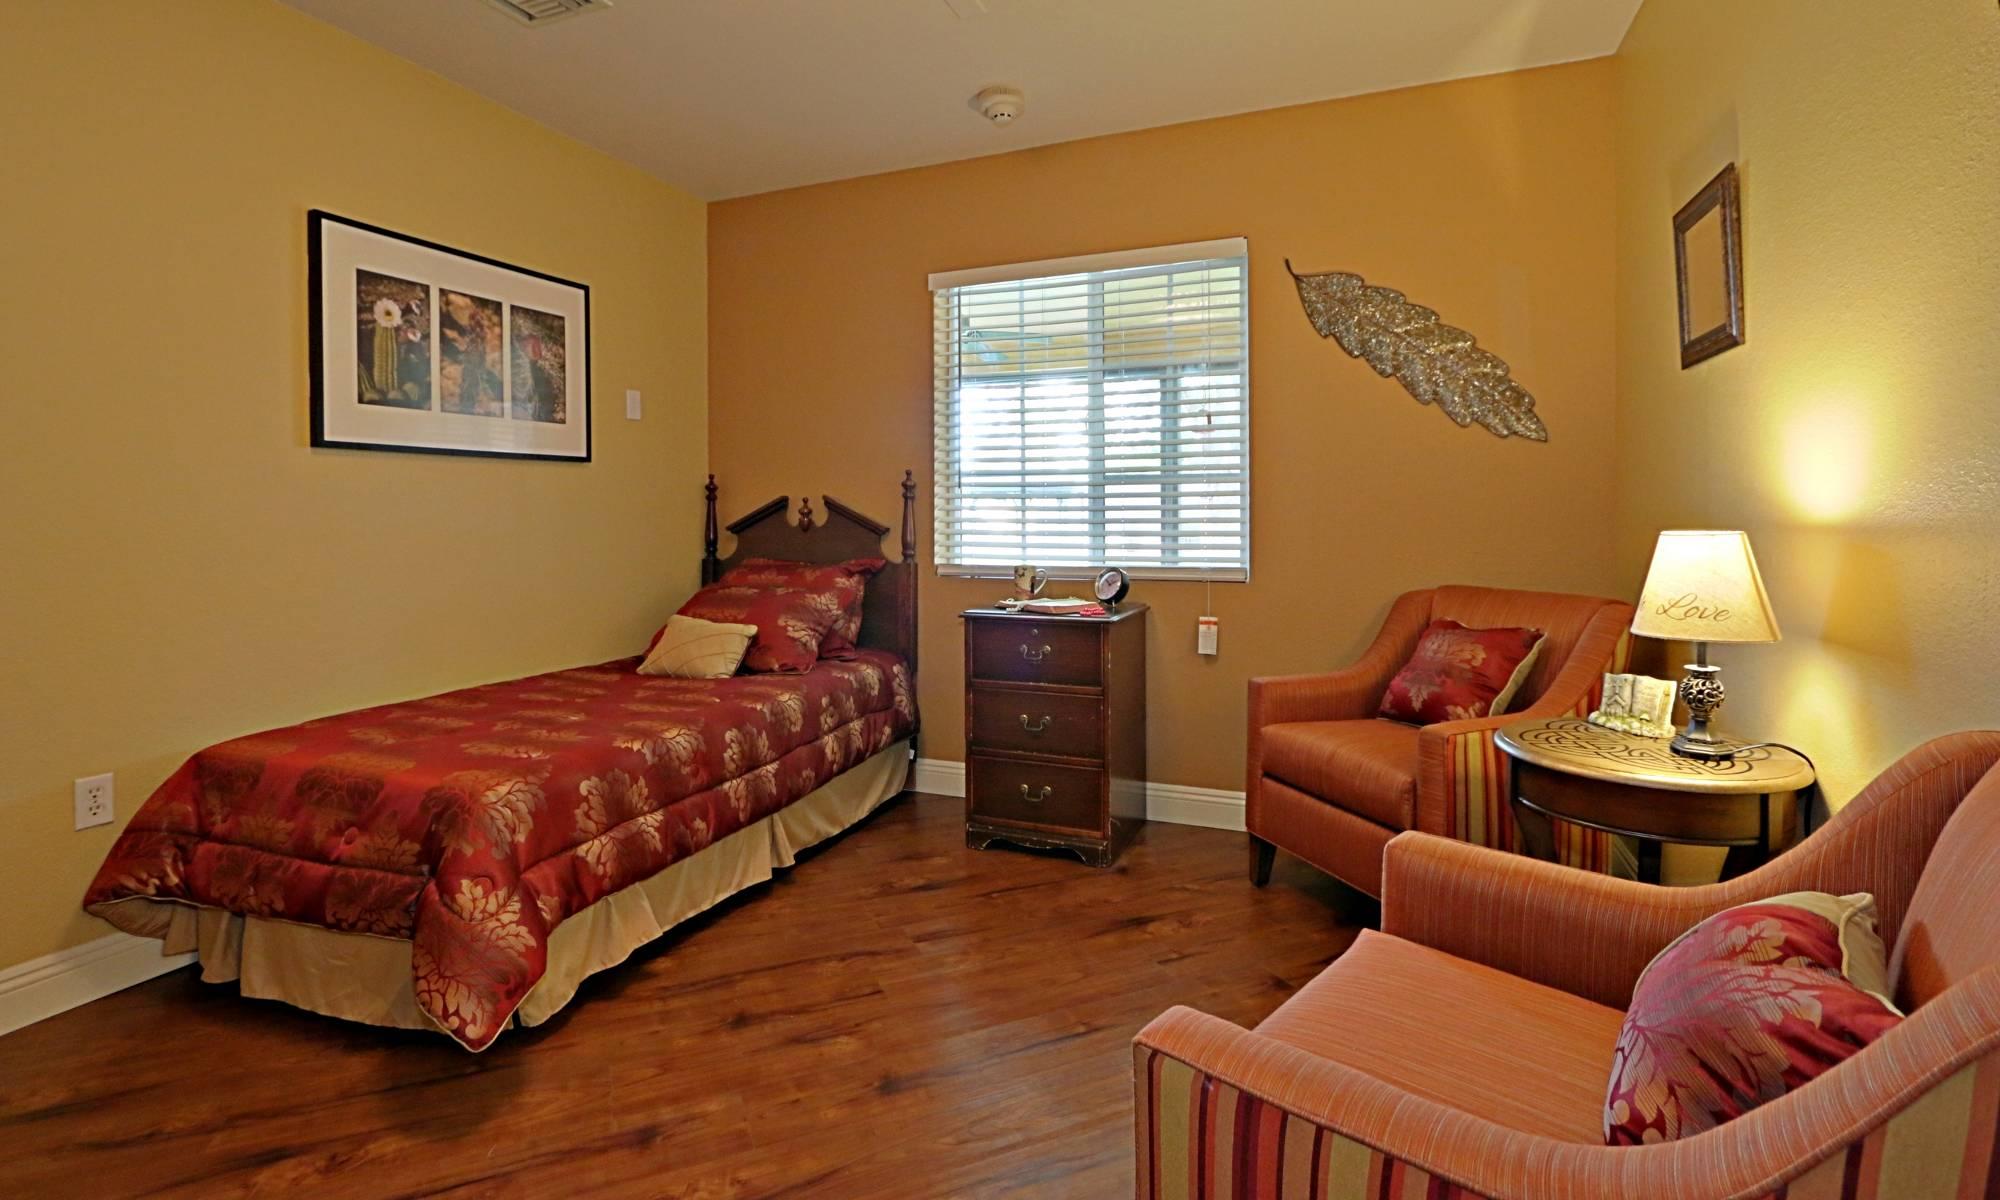 Amazing and spacious room at Pacifica Senior Living Peoria